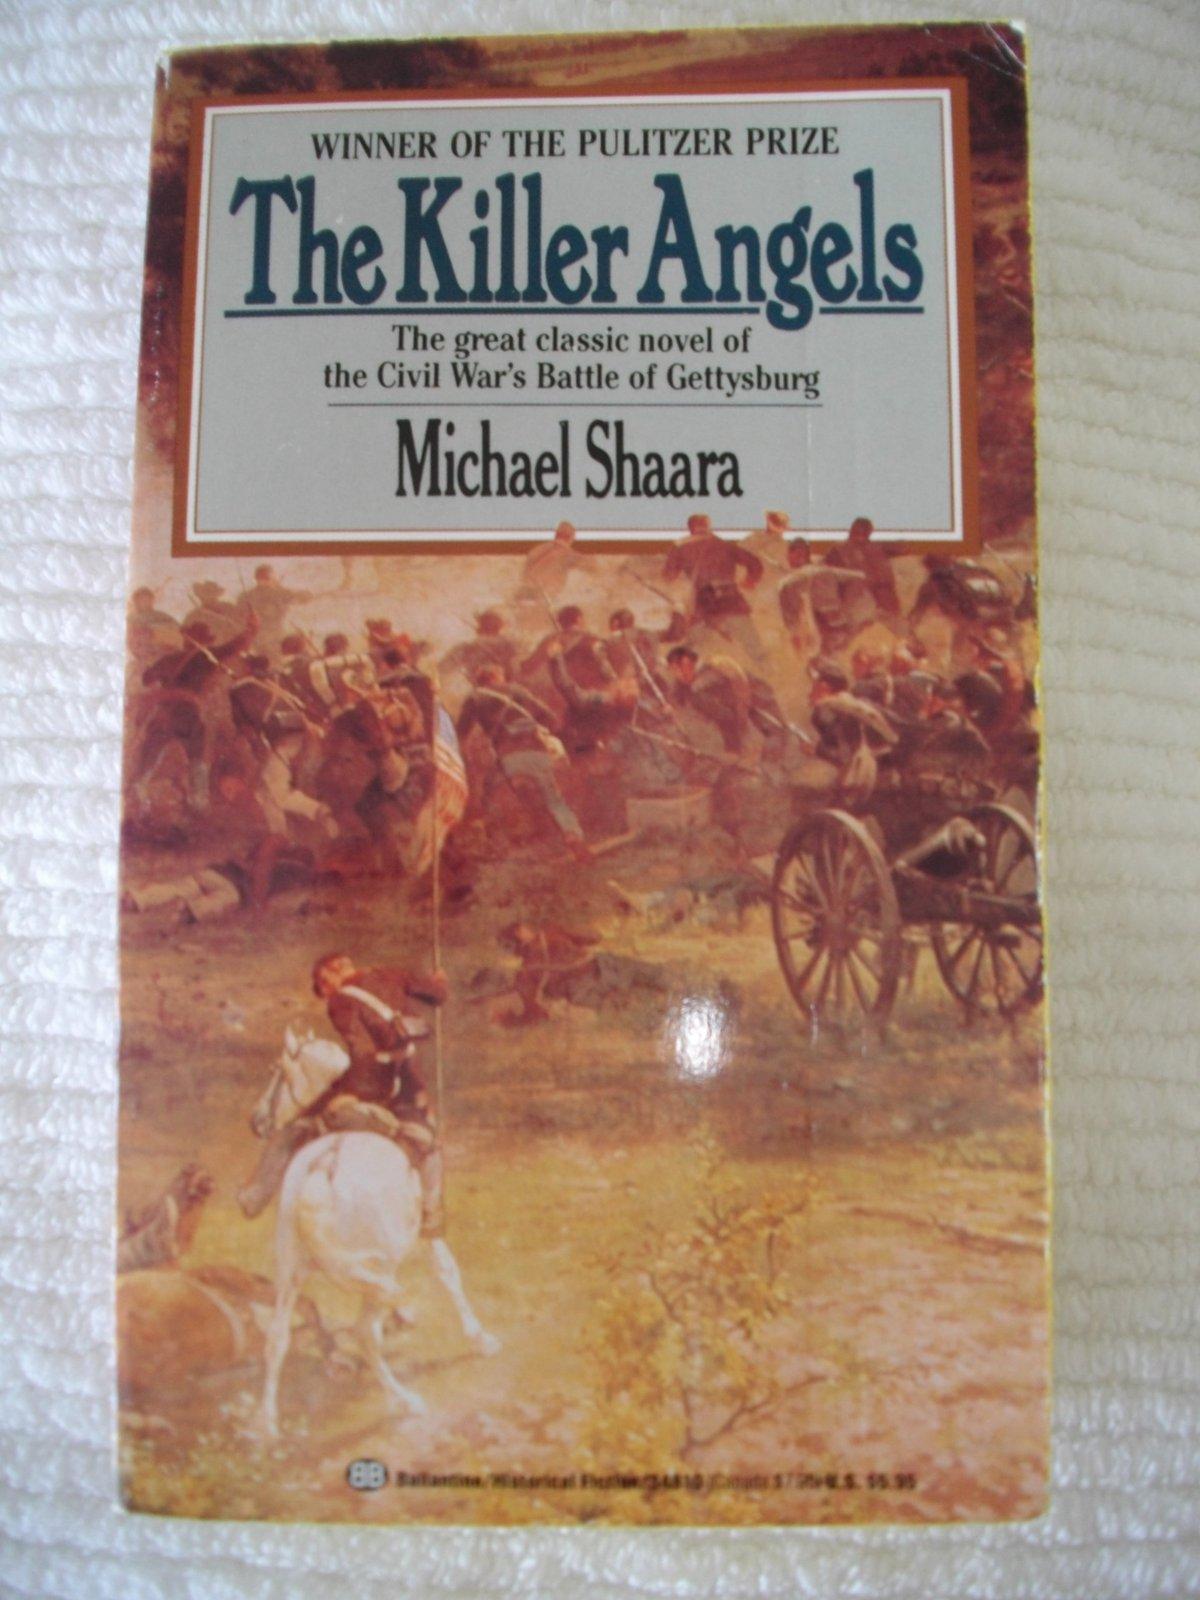 the battle of gettysburg in michael shaaras the killer angels